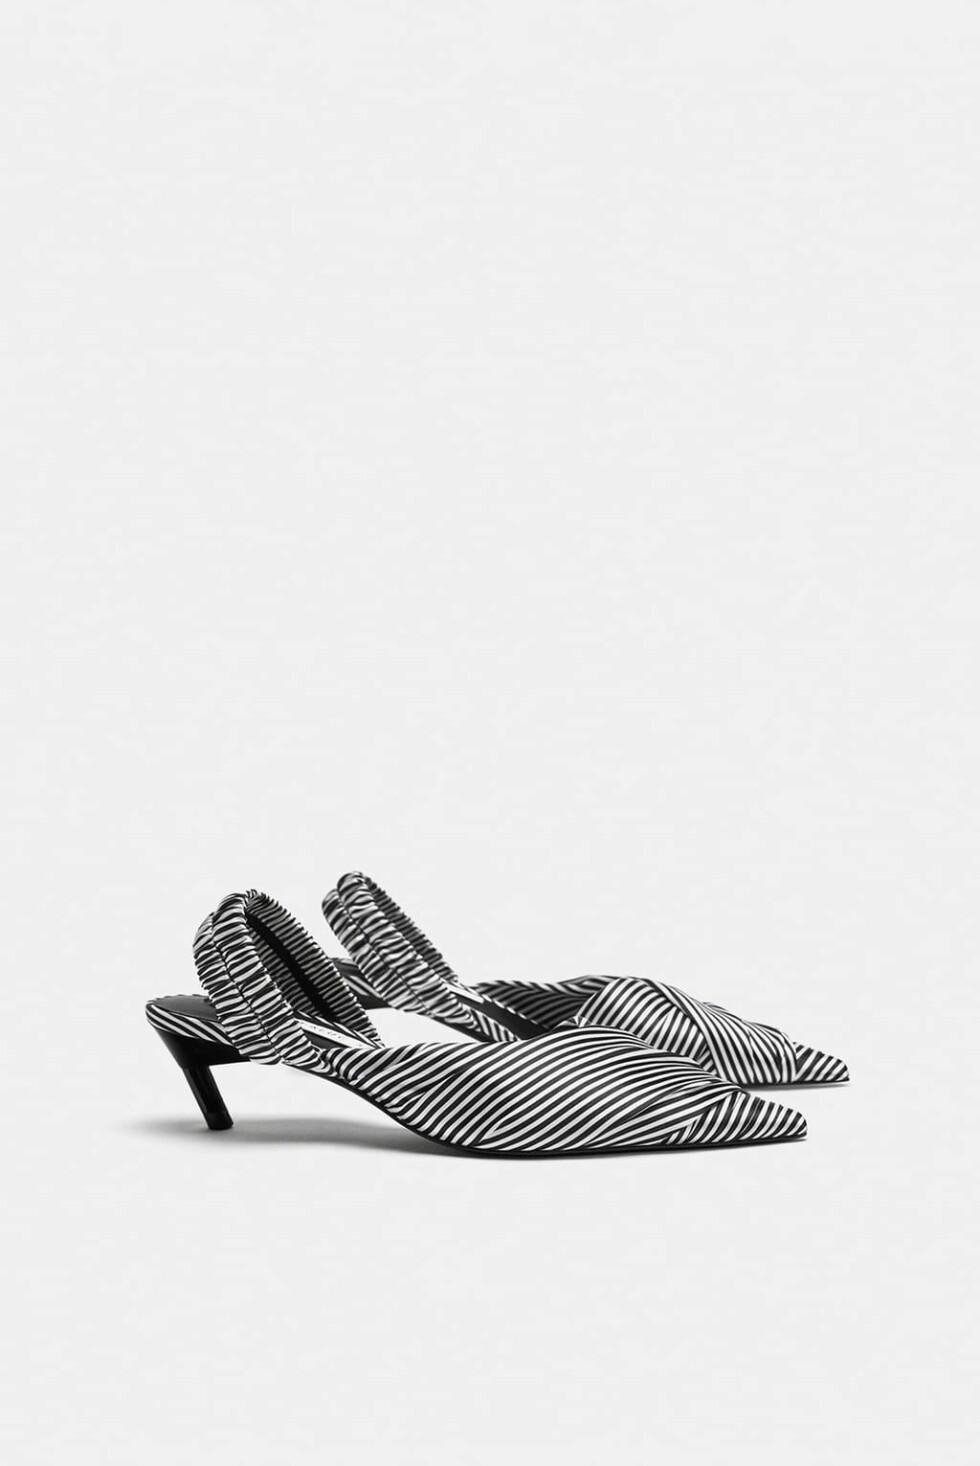 Sko med print fra Zara |250,-| https://www.zara.com/no/no/h%C3%B8yh%C3%A6lt-sko-i-stripet-stoff-med-%C3%A5pen-h%C3%A6l-p13250301.html?v1=6575209&v2=1177663